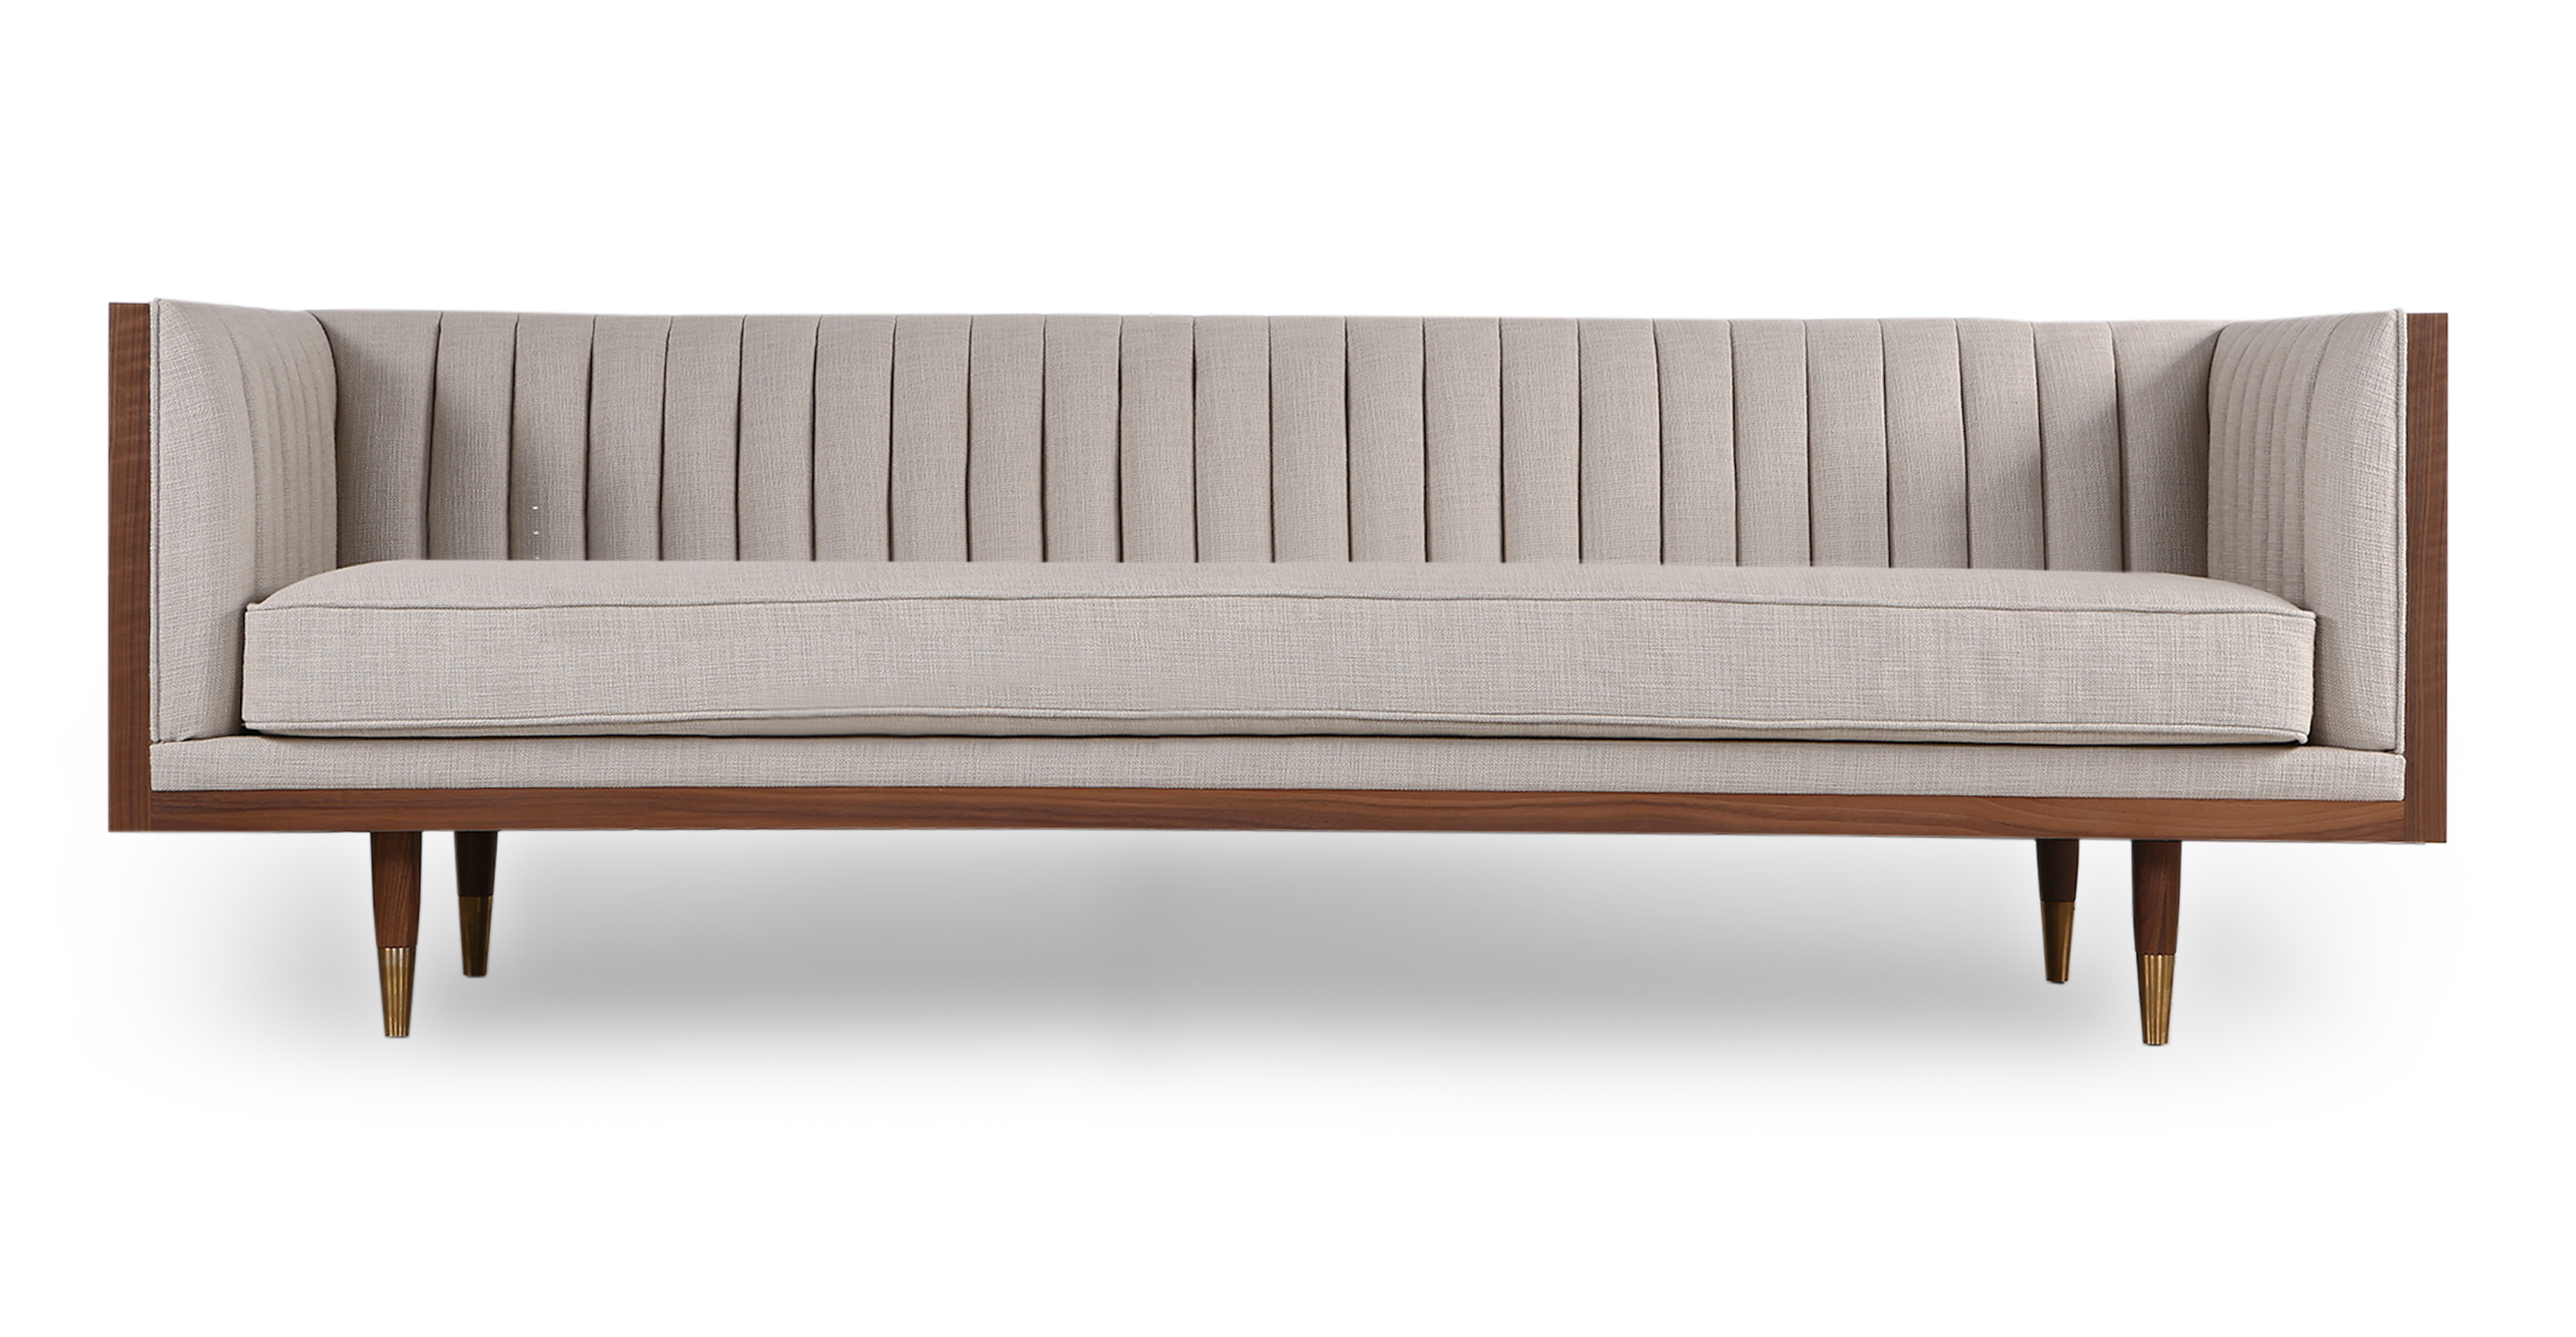 "Woodrow Linea 87"" Fabric Sofa, Walnut/Urban Hemp"